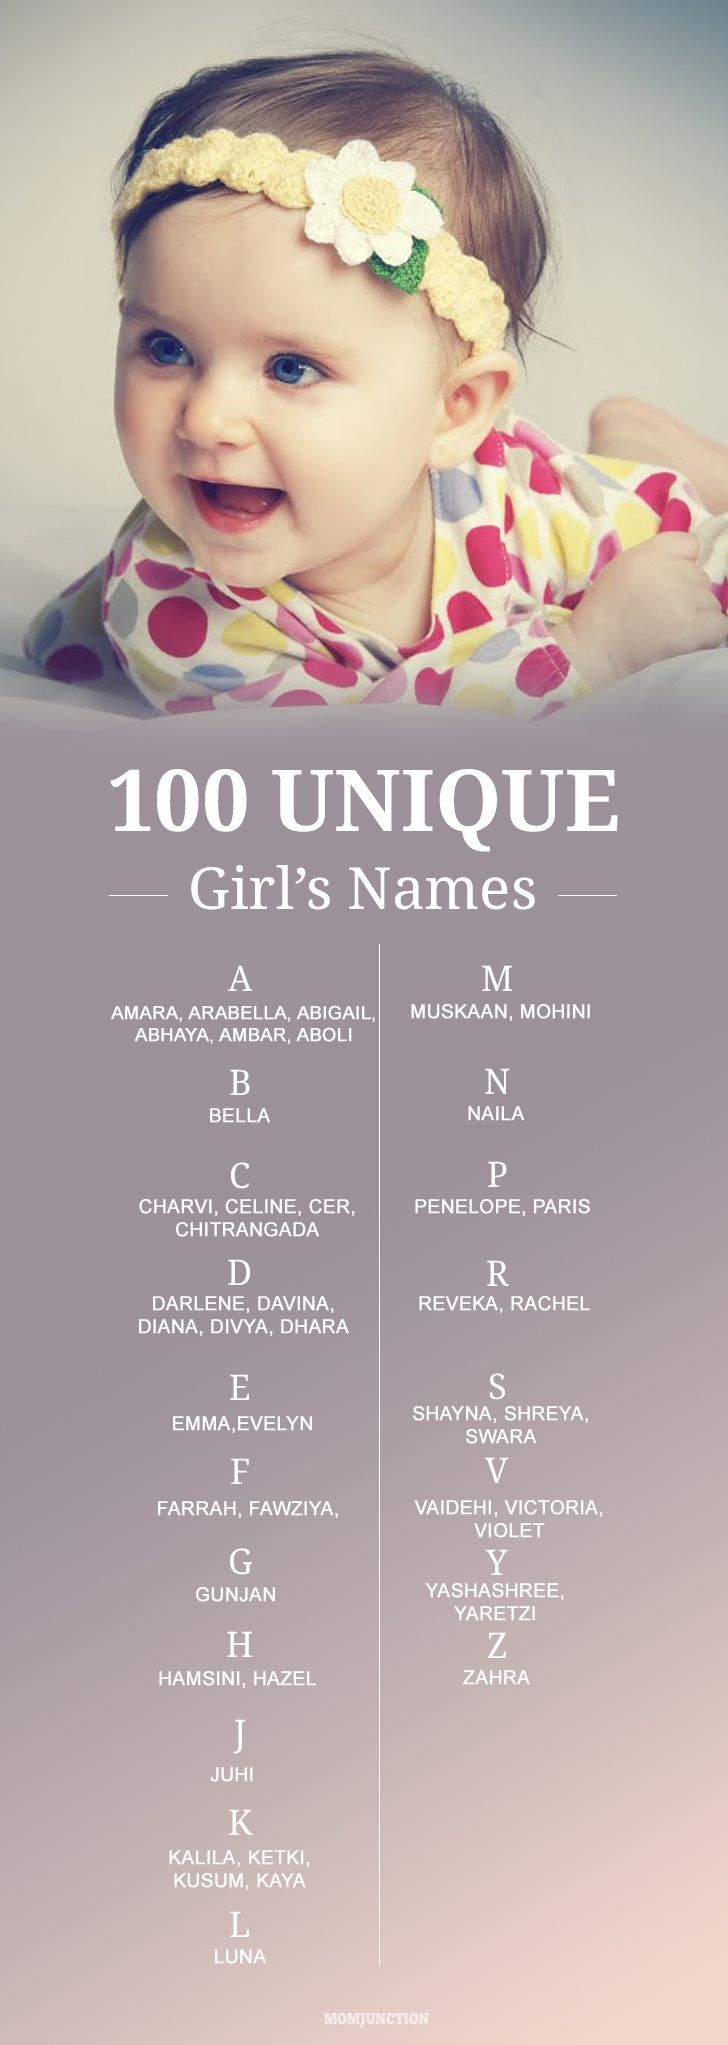 200 az russian girl names beautiful and unique - 728×2045